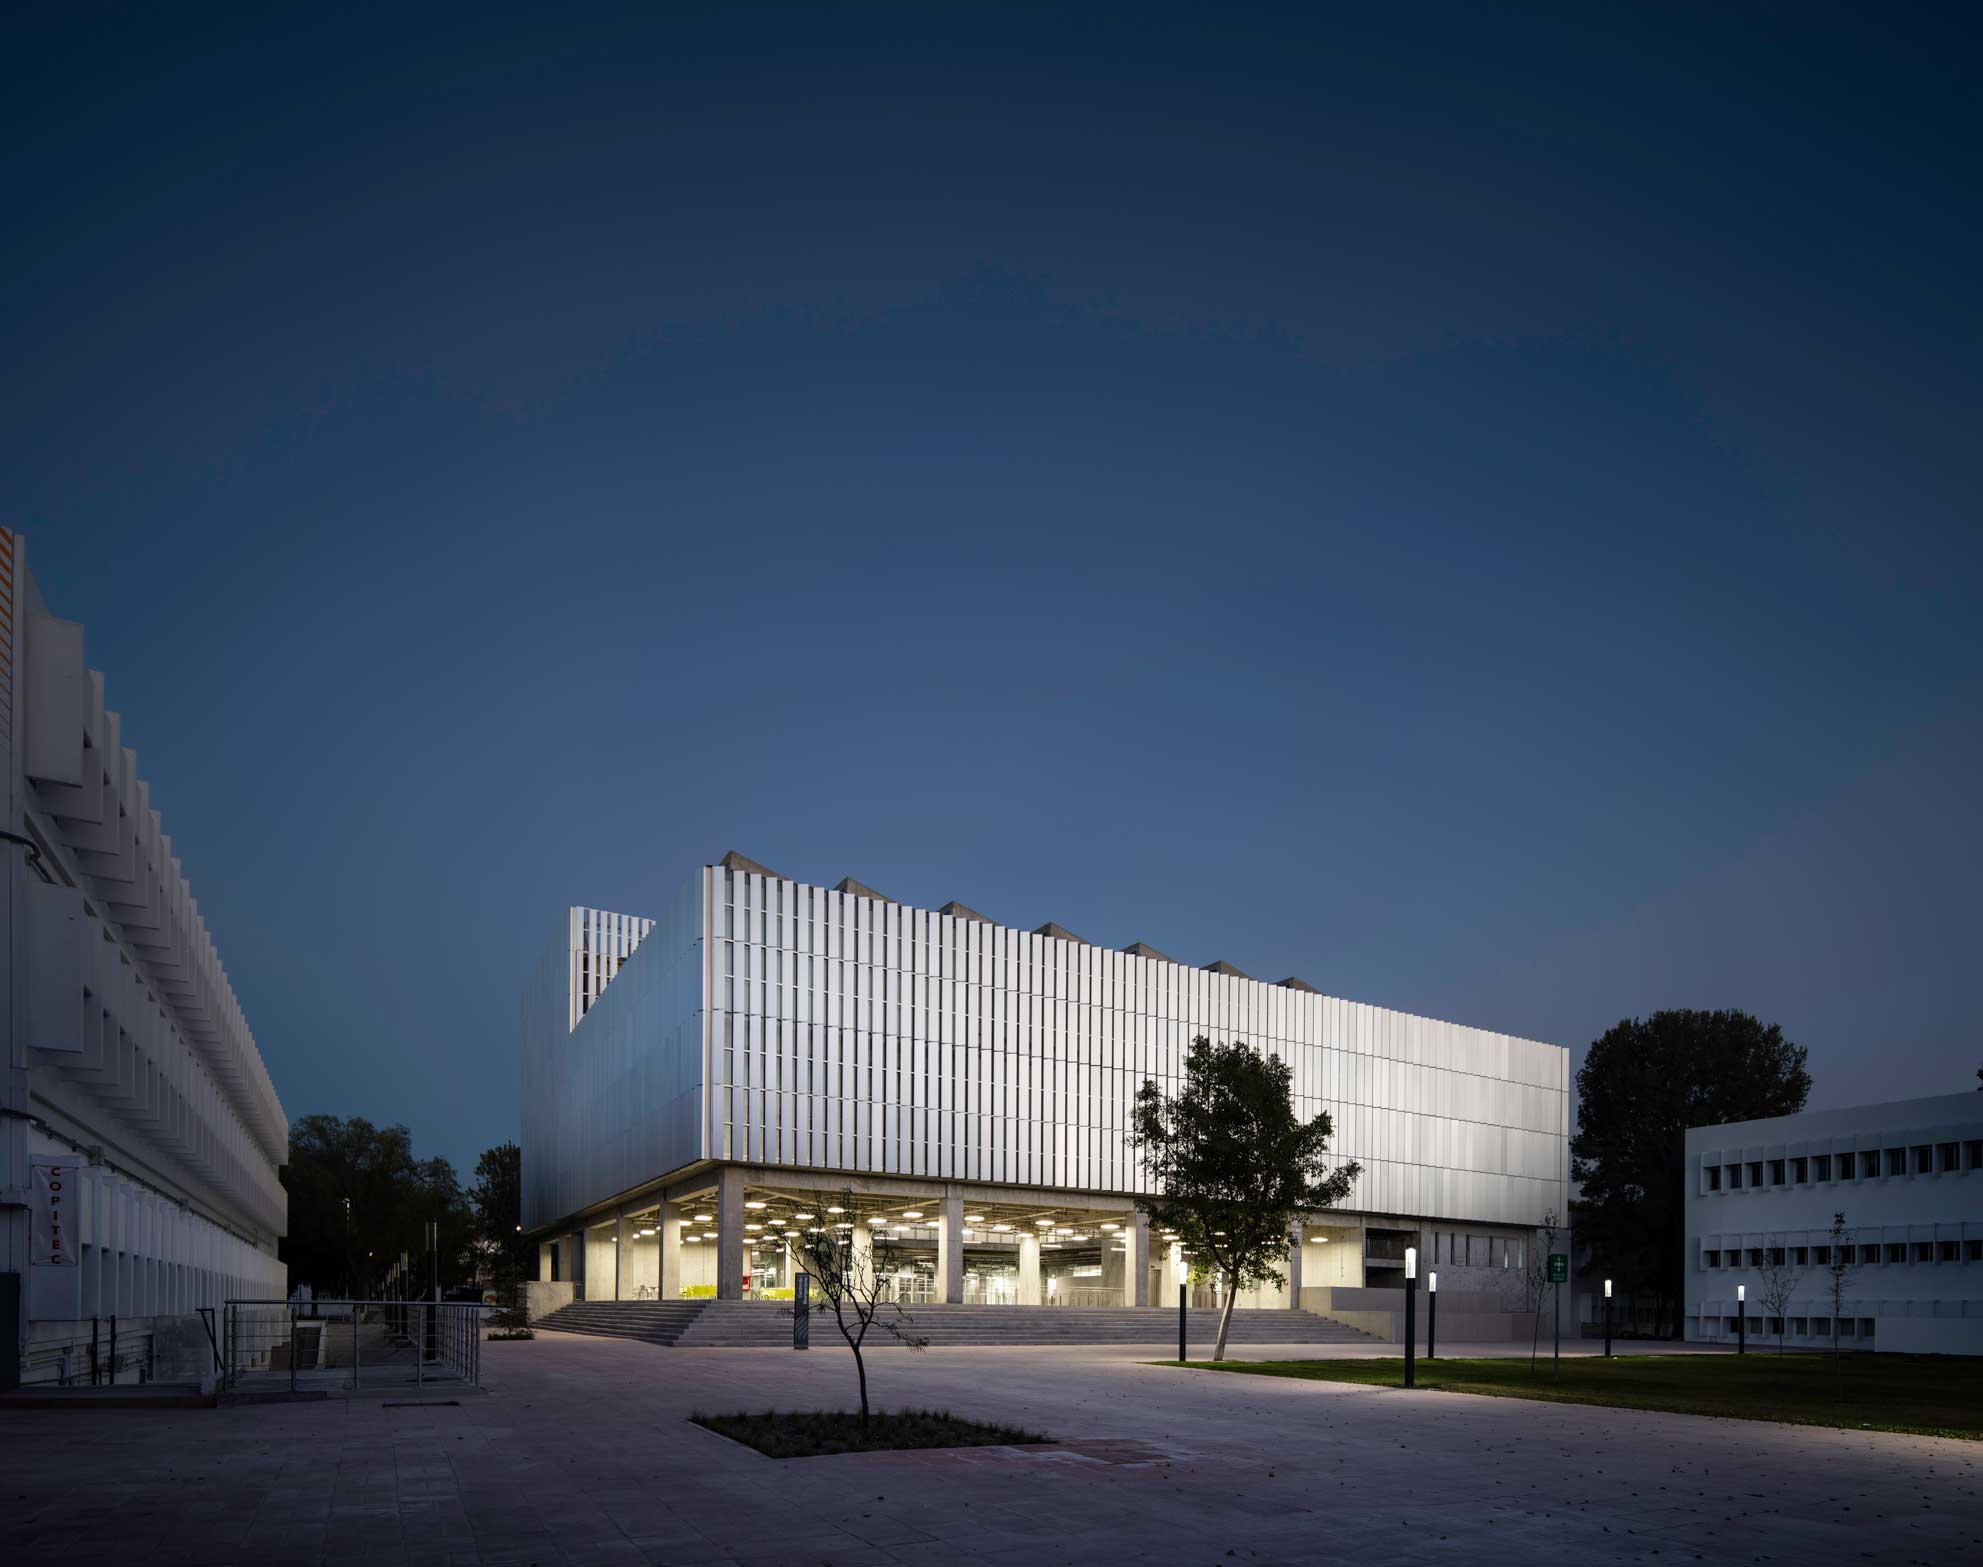 Centro de BioIngeniería – ITESM Campus Querétaro